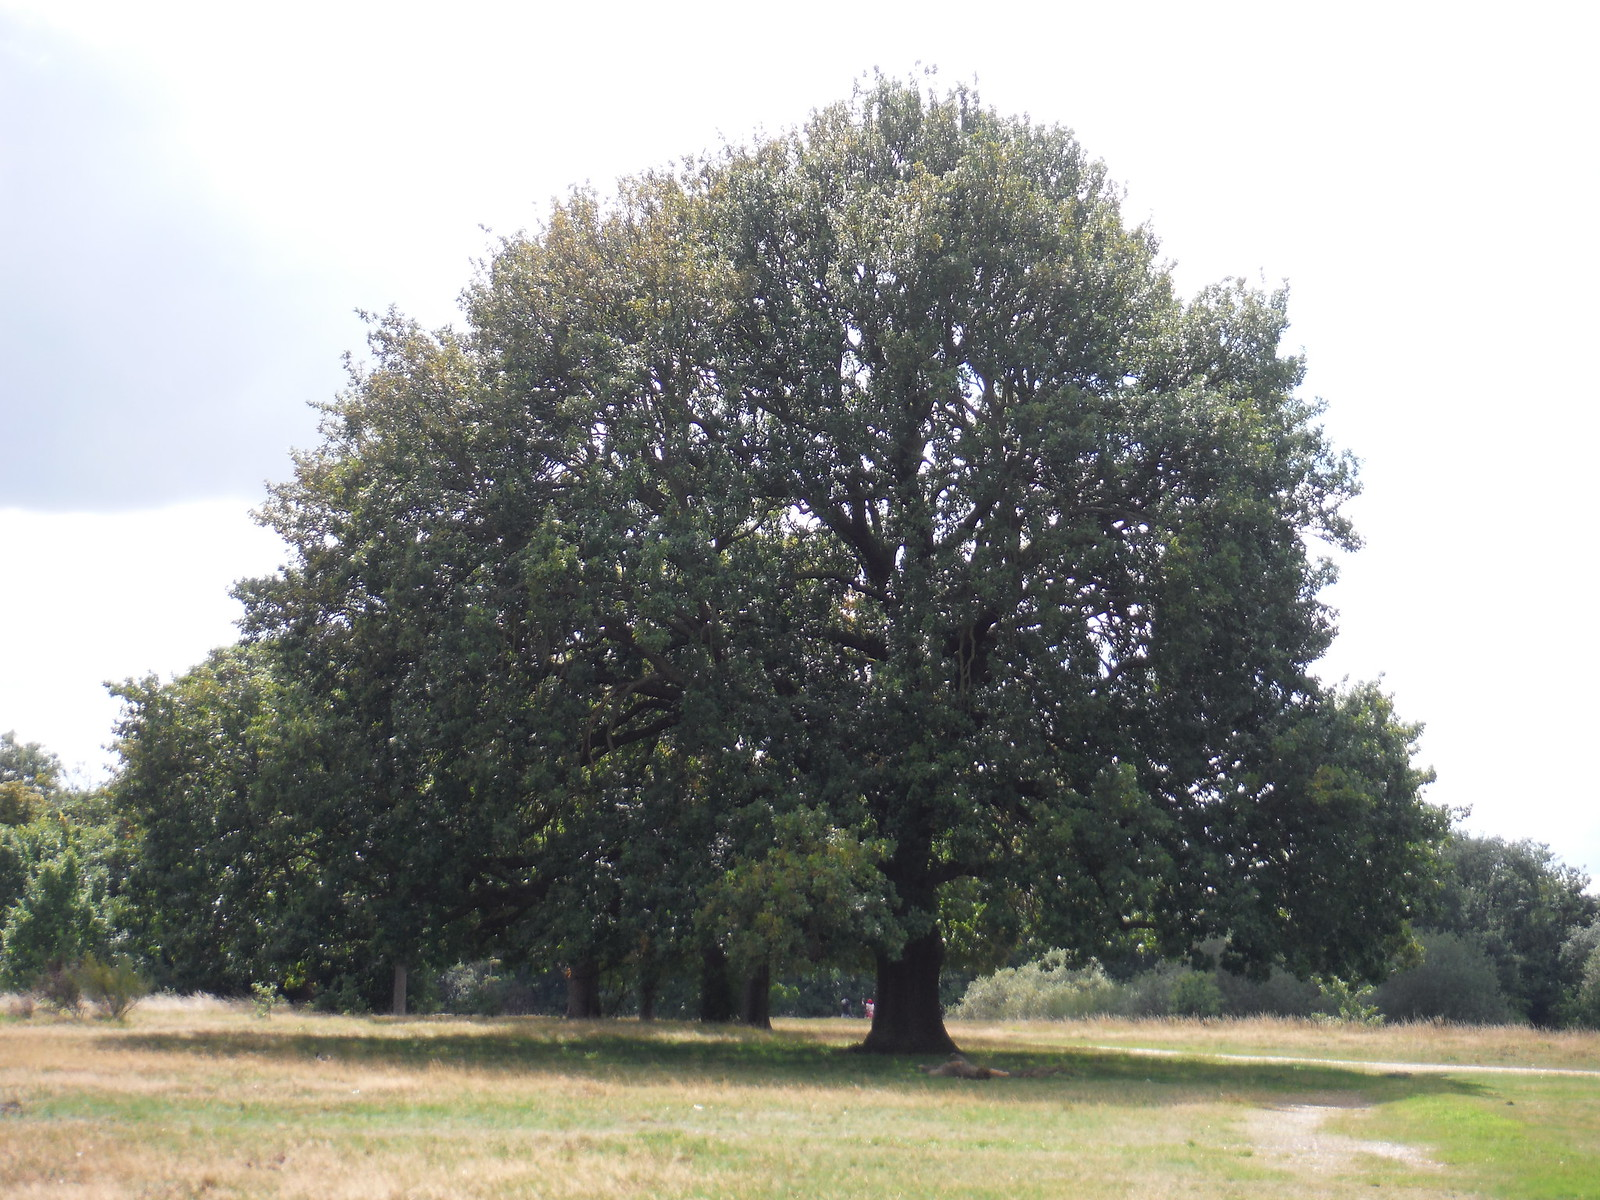 Tree SWC Walk Short 11 - Wanstead Park